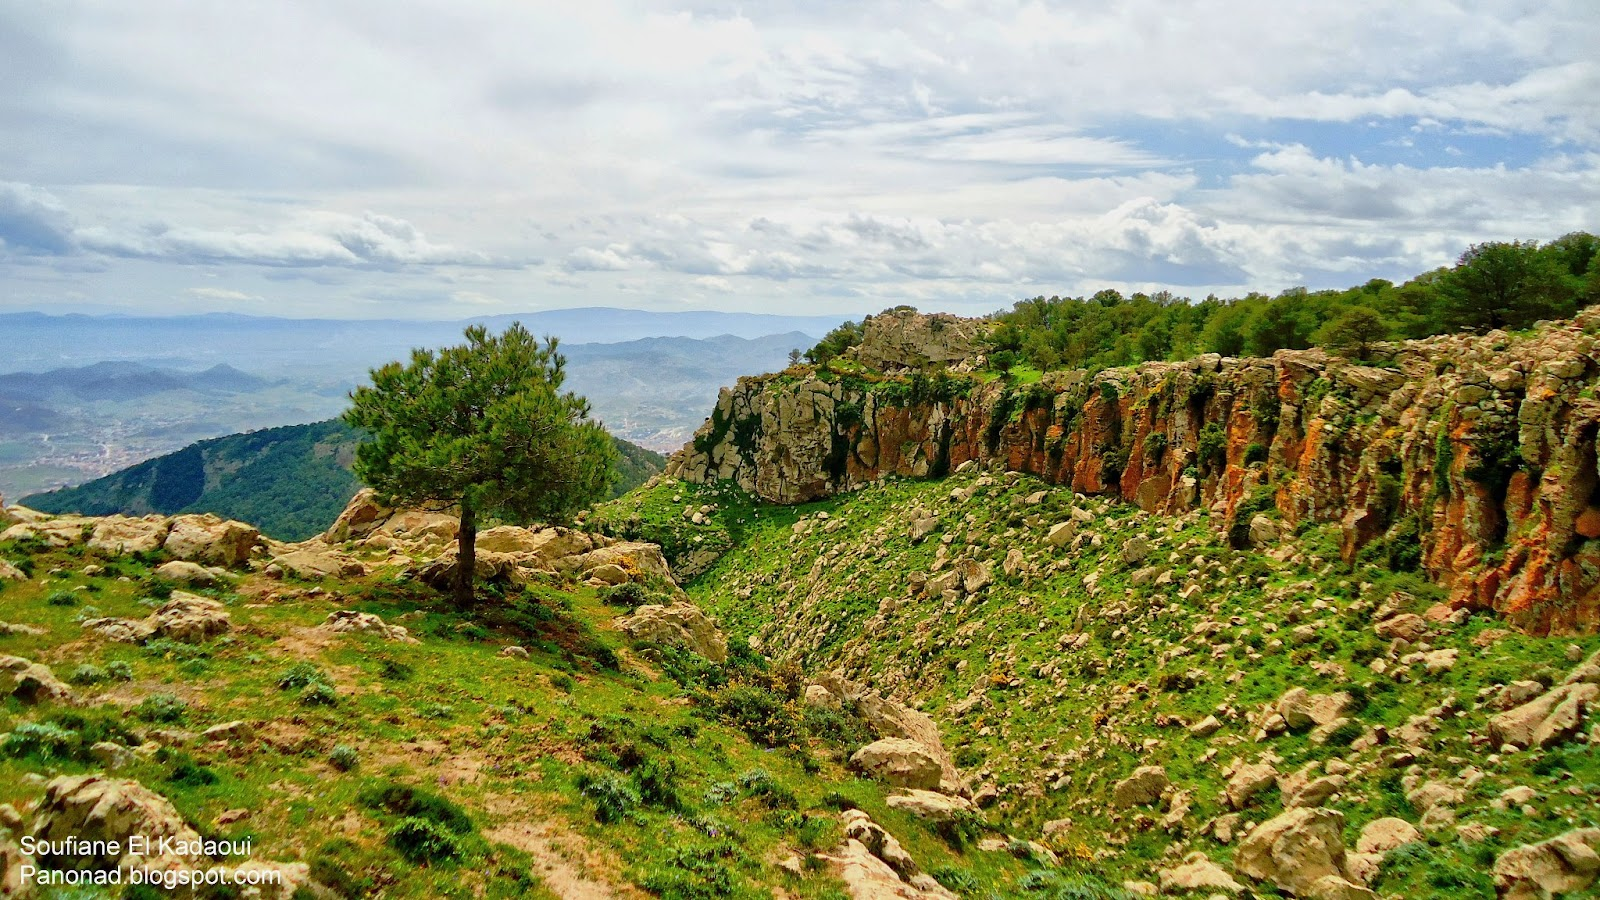 Panorama de Nador بانوراما الناظور: من منتزه كوروكو . Le